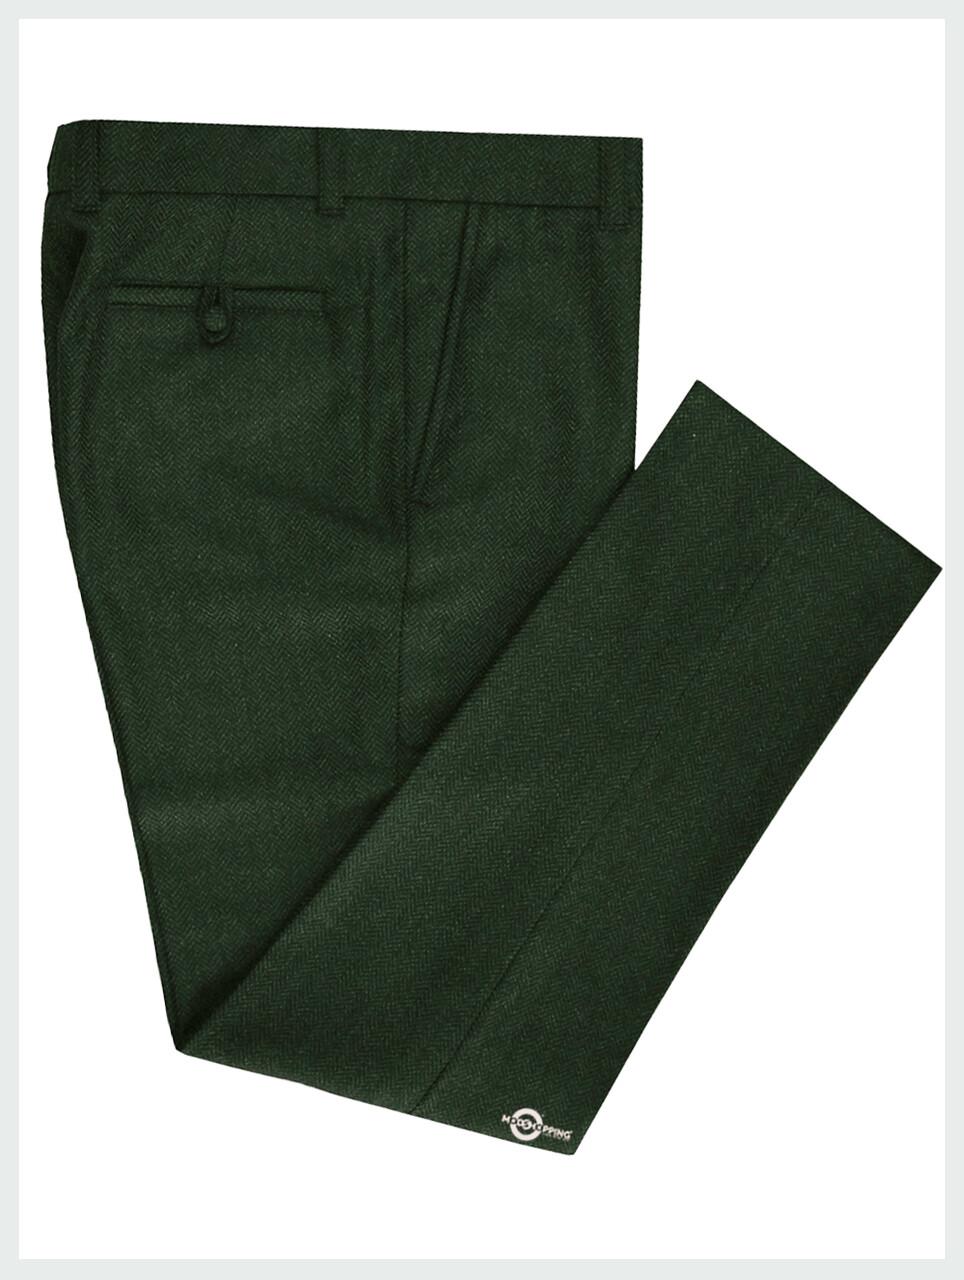 Mod Tweed Trouser | Dark Green Color Mod Trouser For Men